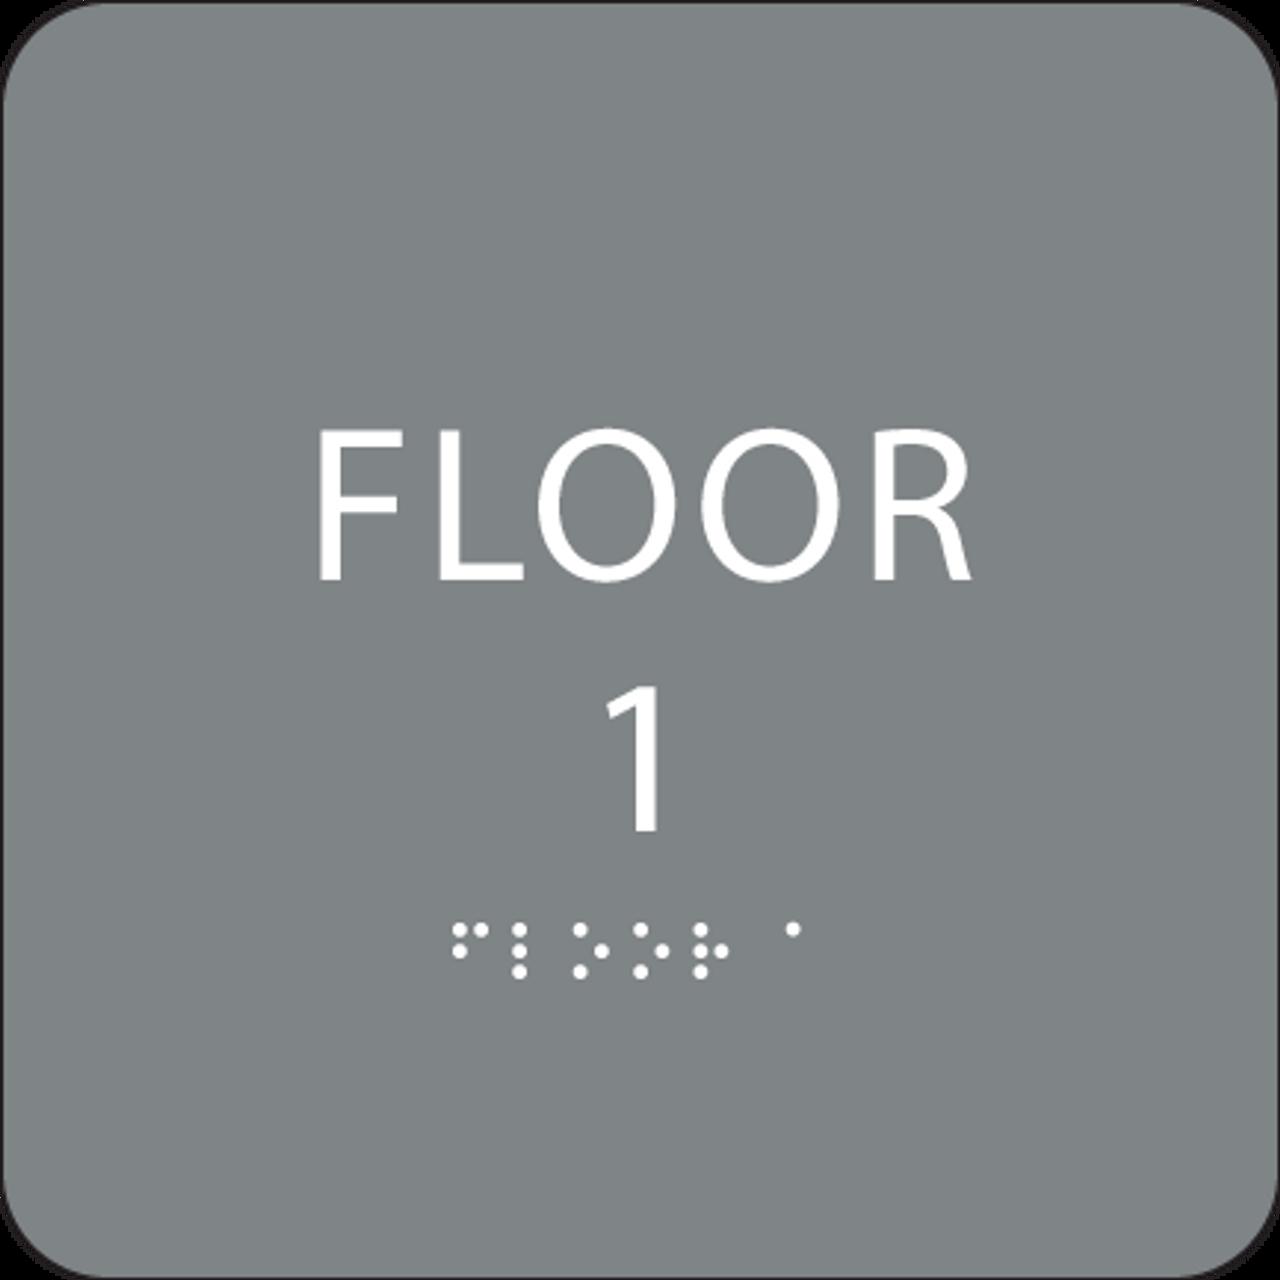 Grey Floor 1 Identification Sign